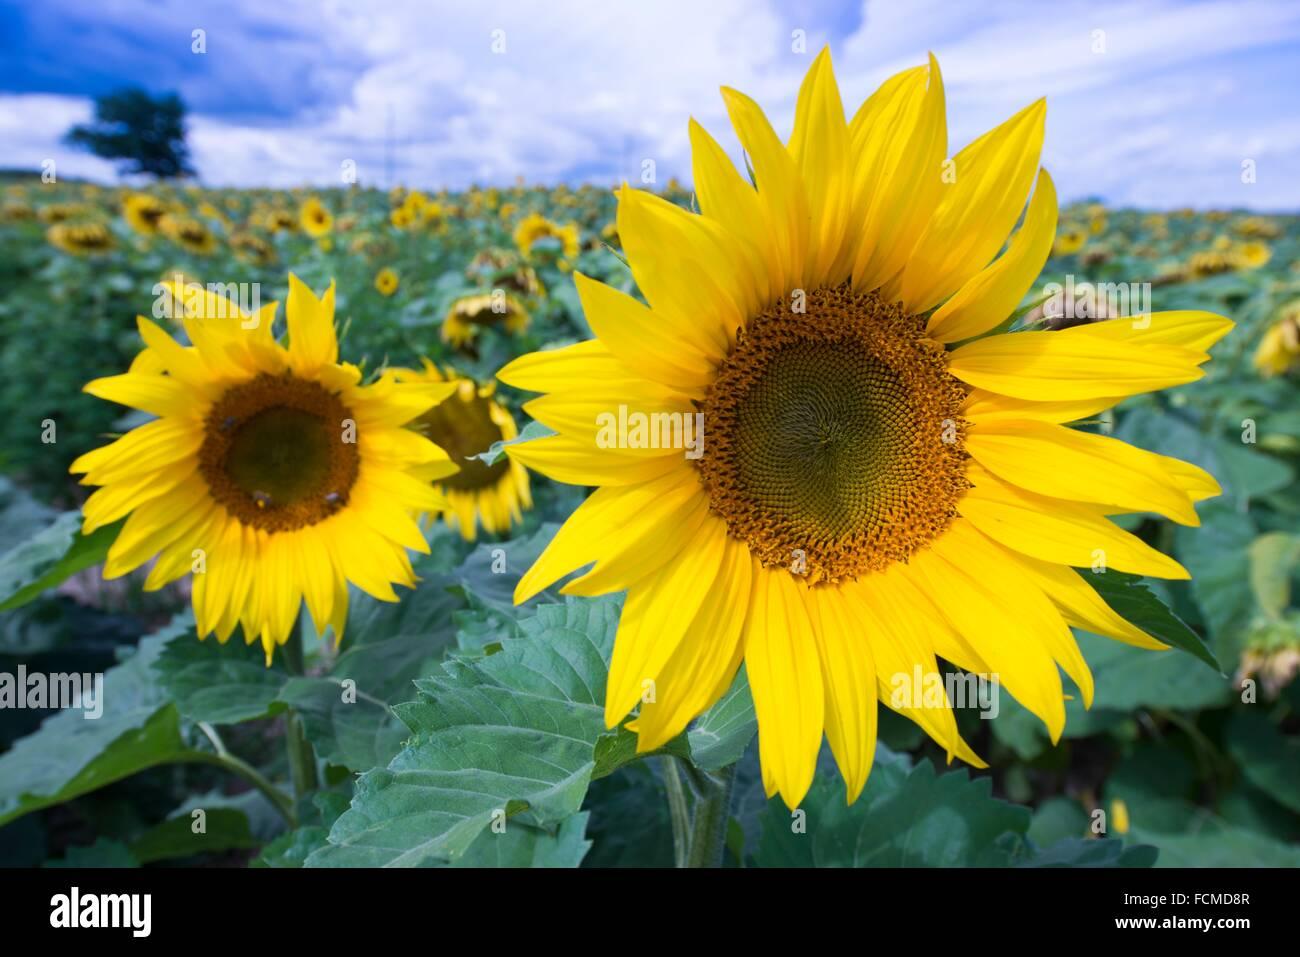 Sunflowers, Prince Edward County, Ontario, Canada - Stock Image